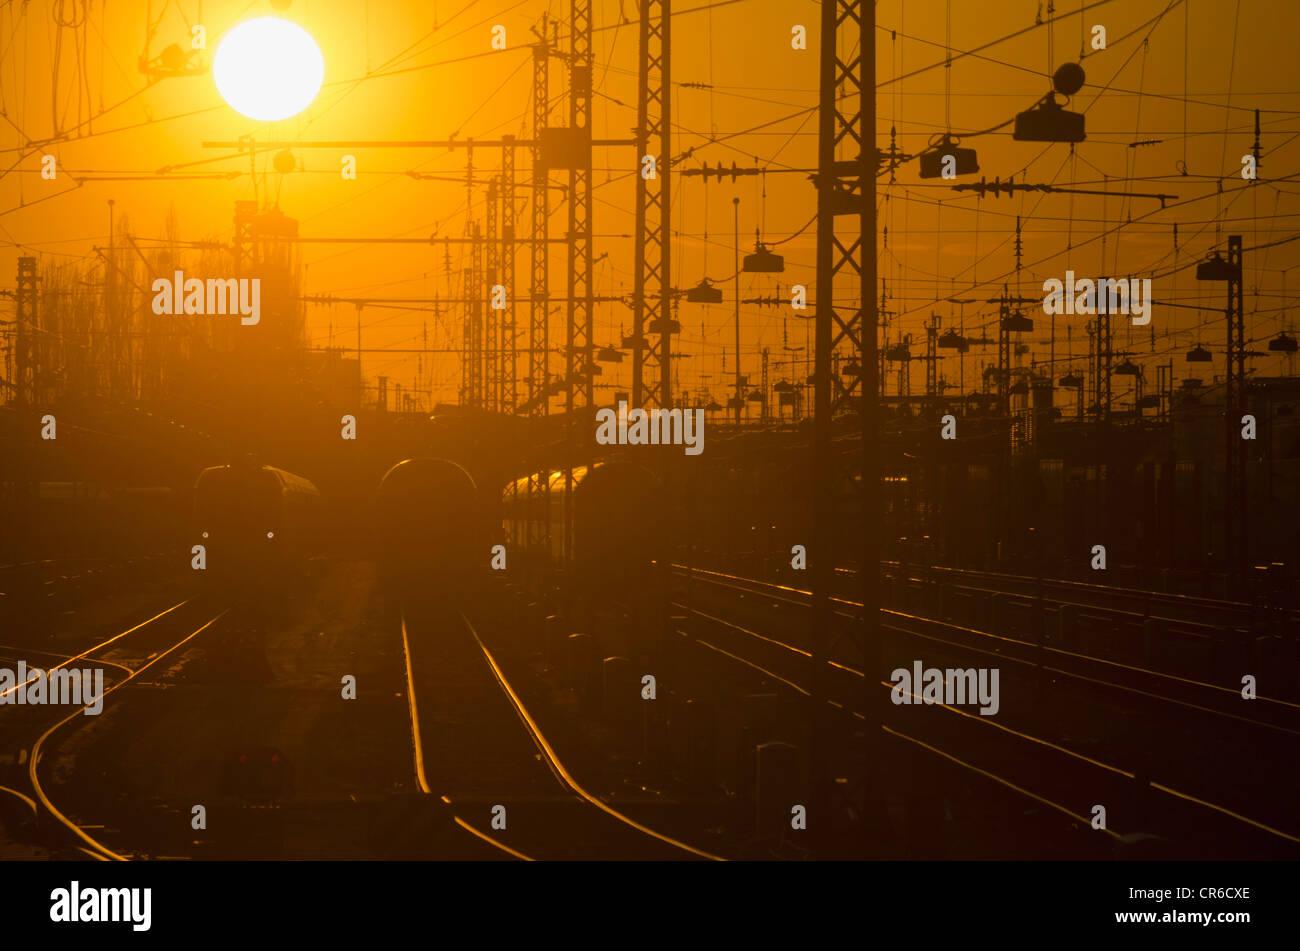 Germany, Bavaria, Munich, View of main station at sunset - Stock Image